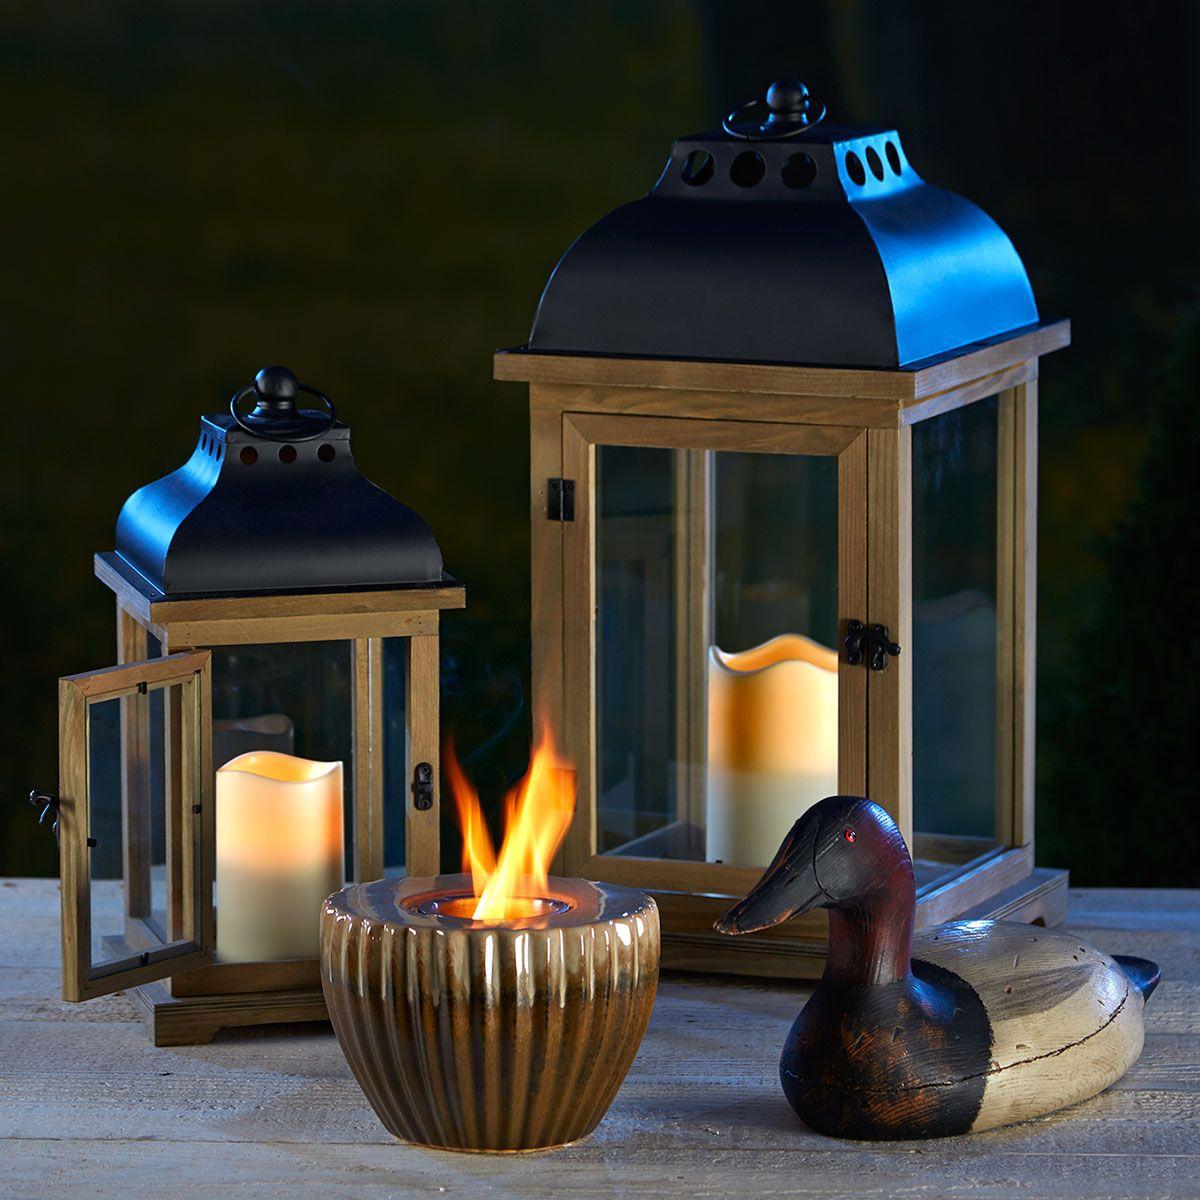 Wooden Lanterns. Ceramic Fire Pot. Duck Statue. imagens)